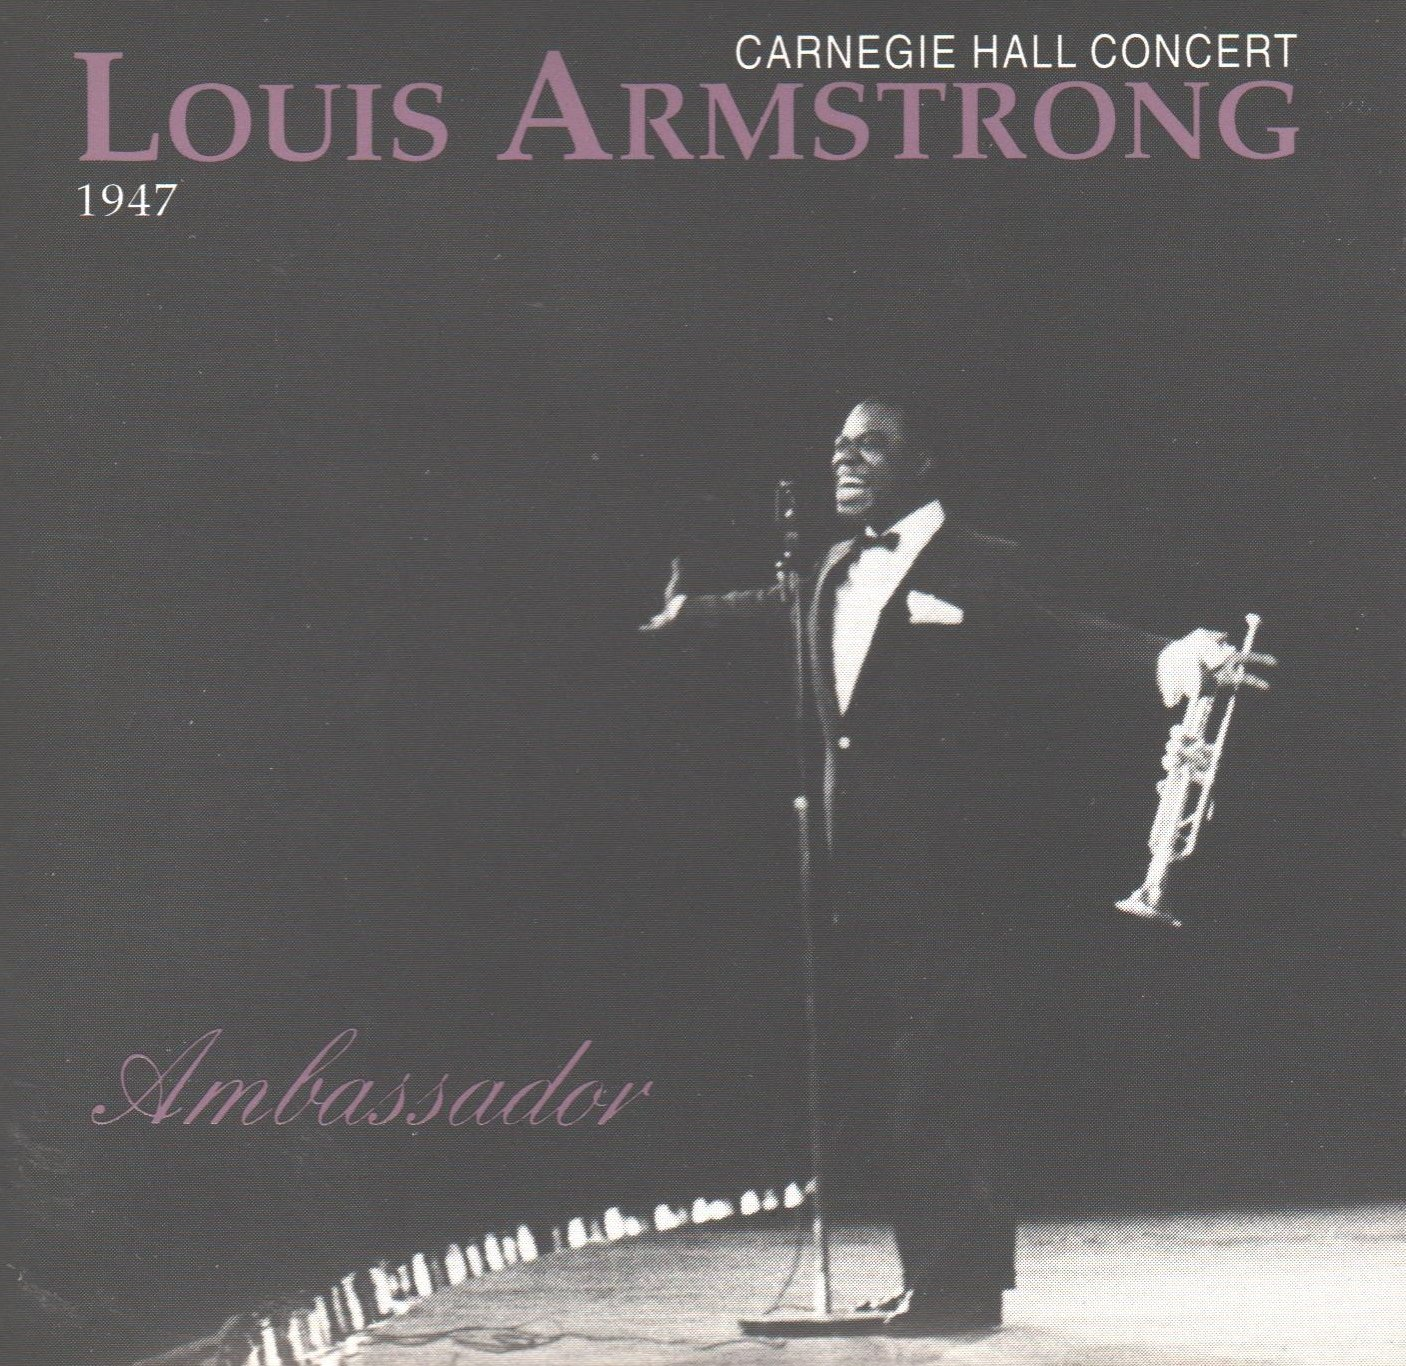 Carnegie Hall Concert 1947